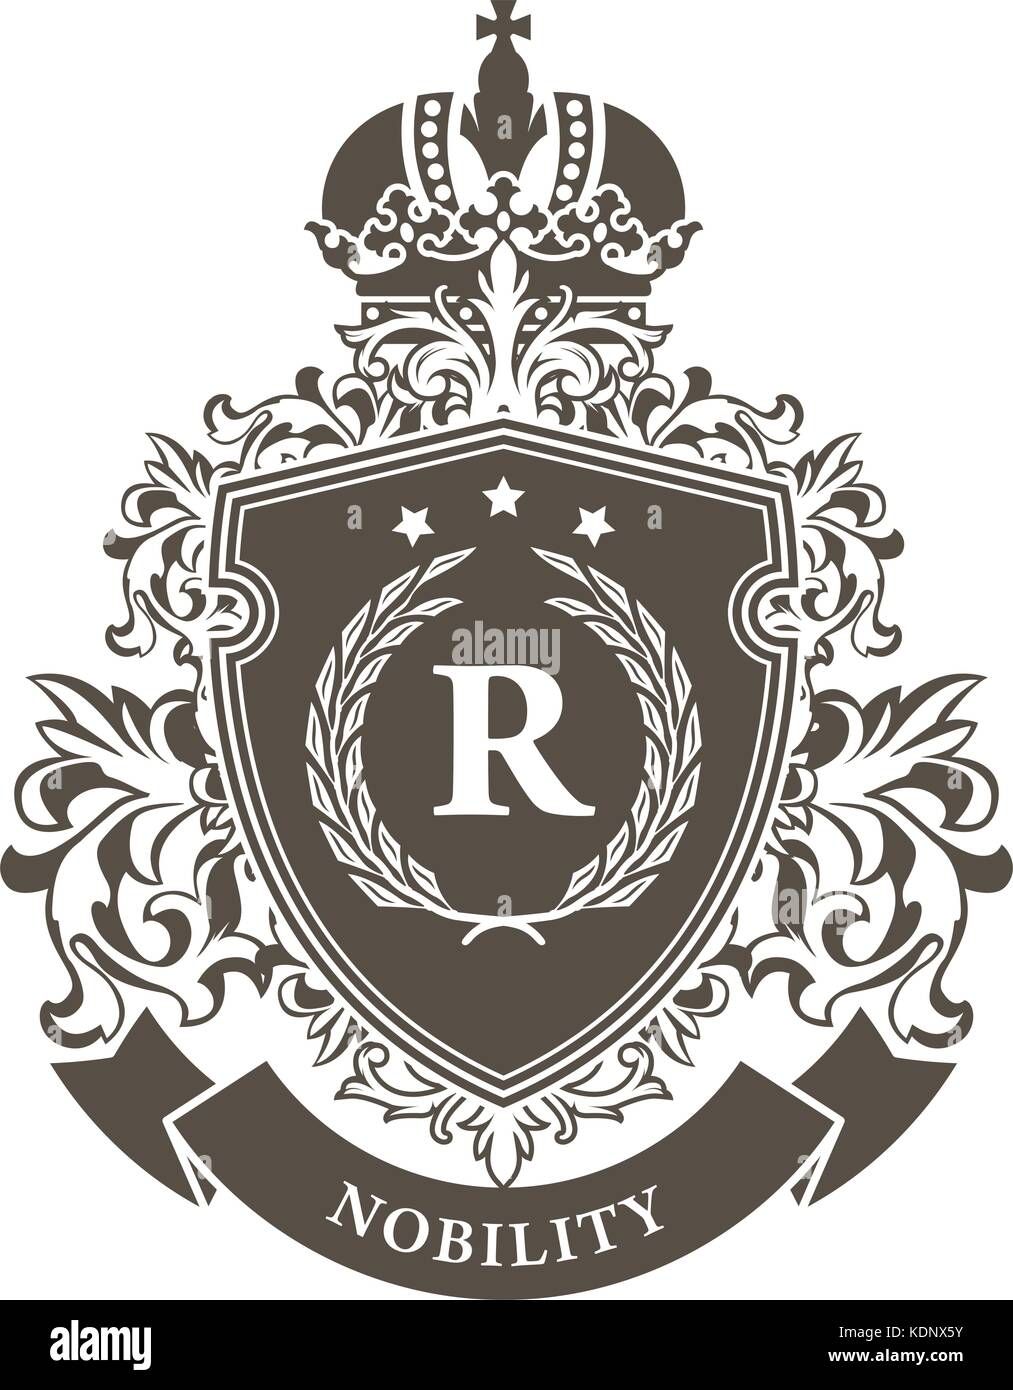 Royal Gate Dodge >> Royal Emblem Stock Photos & Royal Emblem Stock Images - Alamy